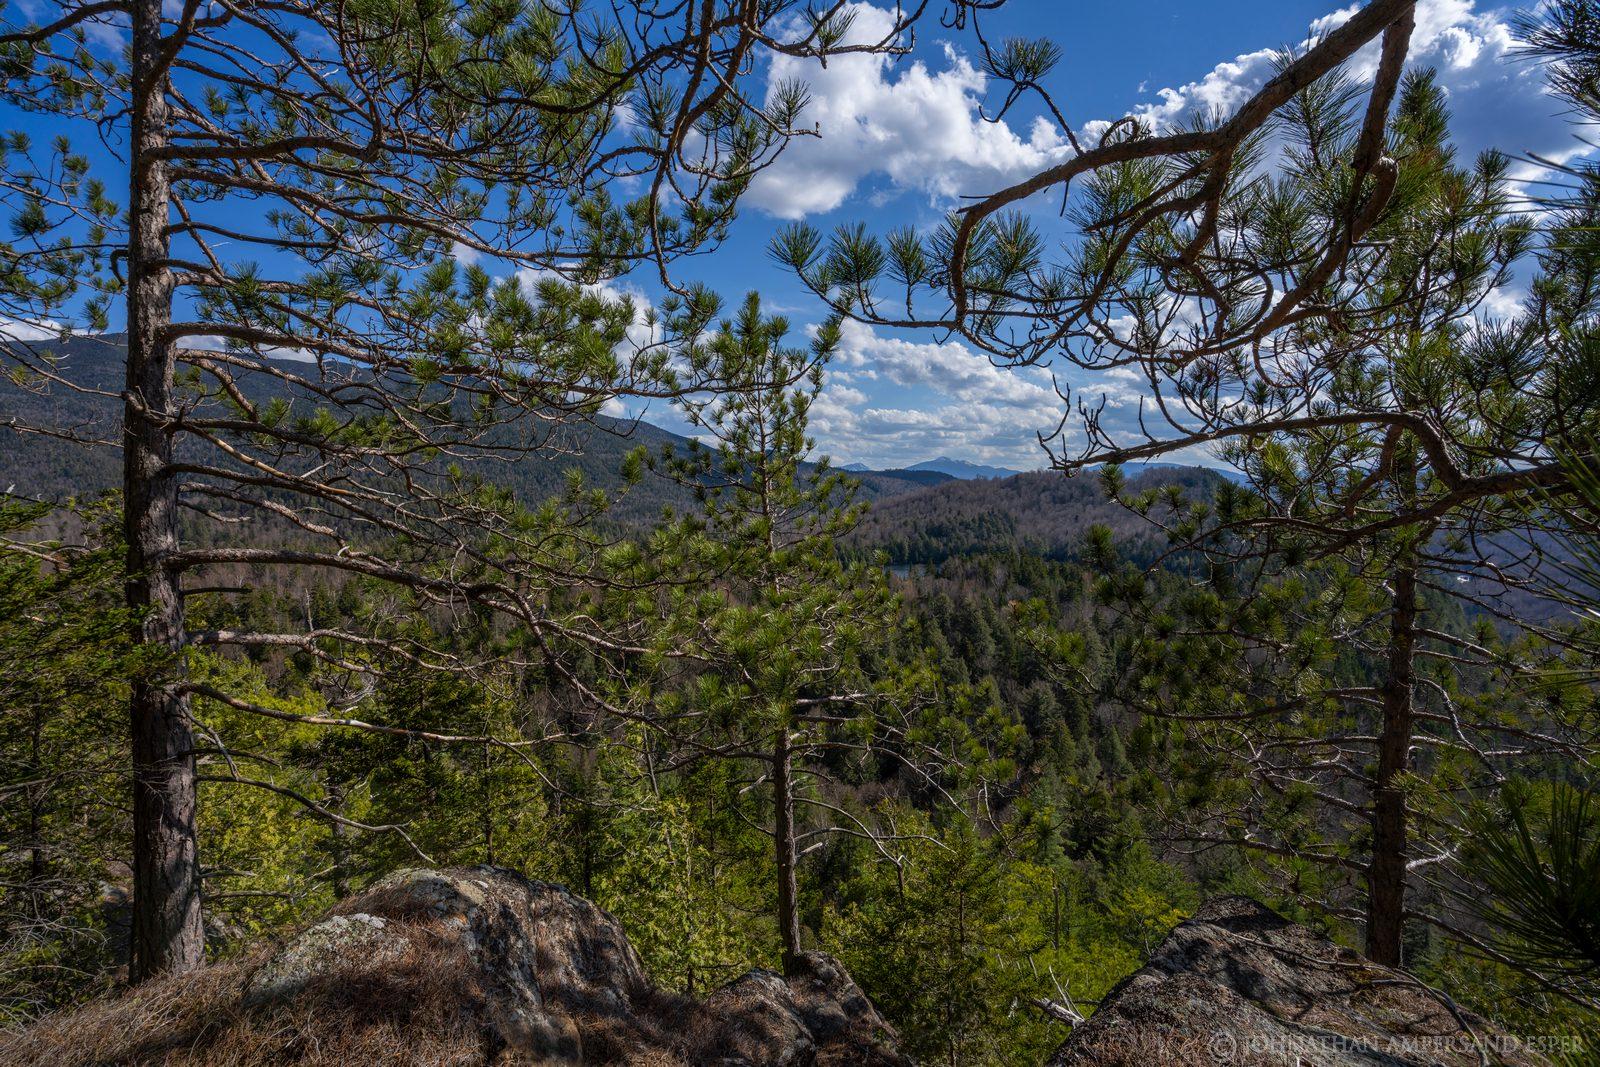 Notch Mountain,Notch Mt,Wilmington Notch,sunny,spring,day,cliffs,bushwack,pines,High Peaks